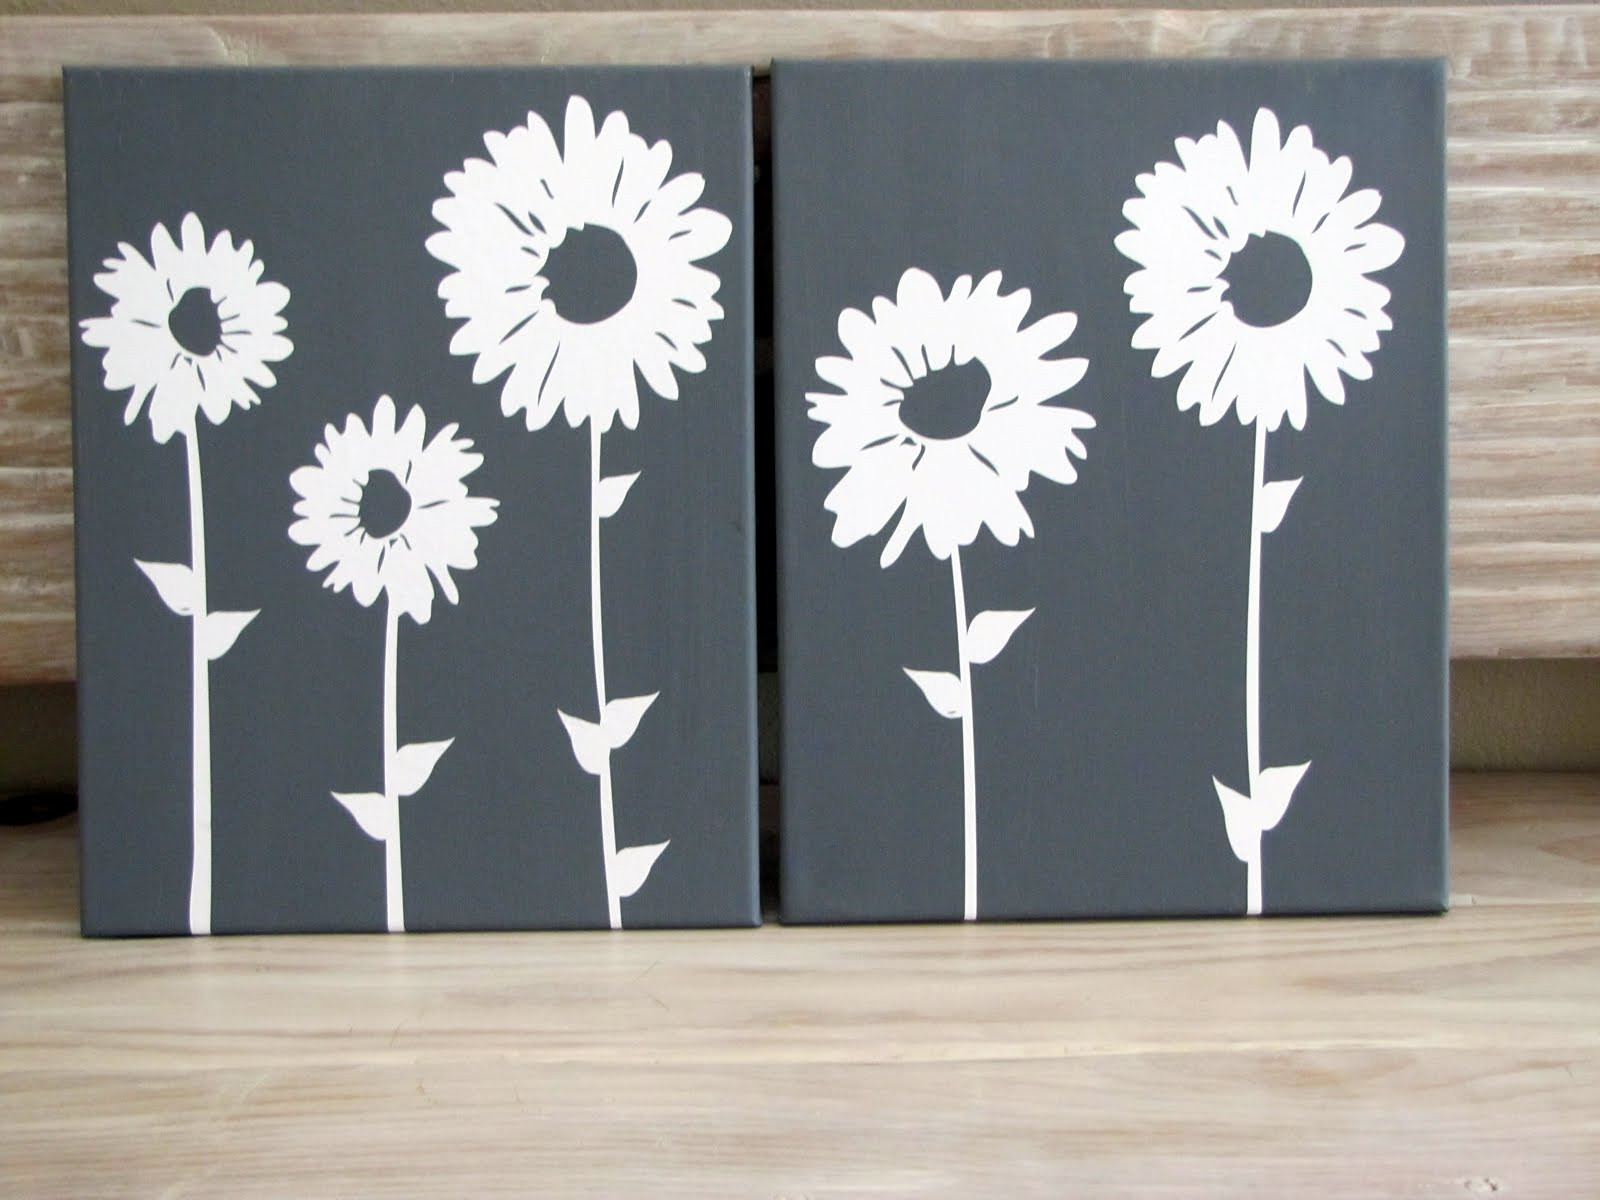 Best ideas about Vinyl Wall Art . Save or Pin Vinyl Wall Art Canvas TUTORIAL craft Little Miss Momma Now.